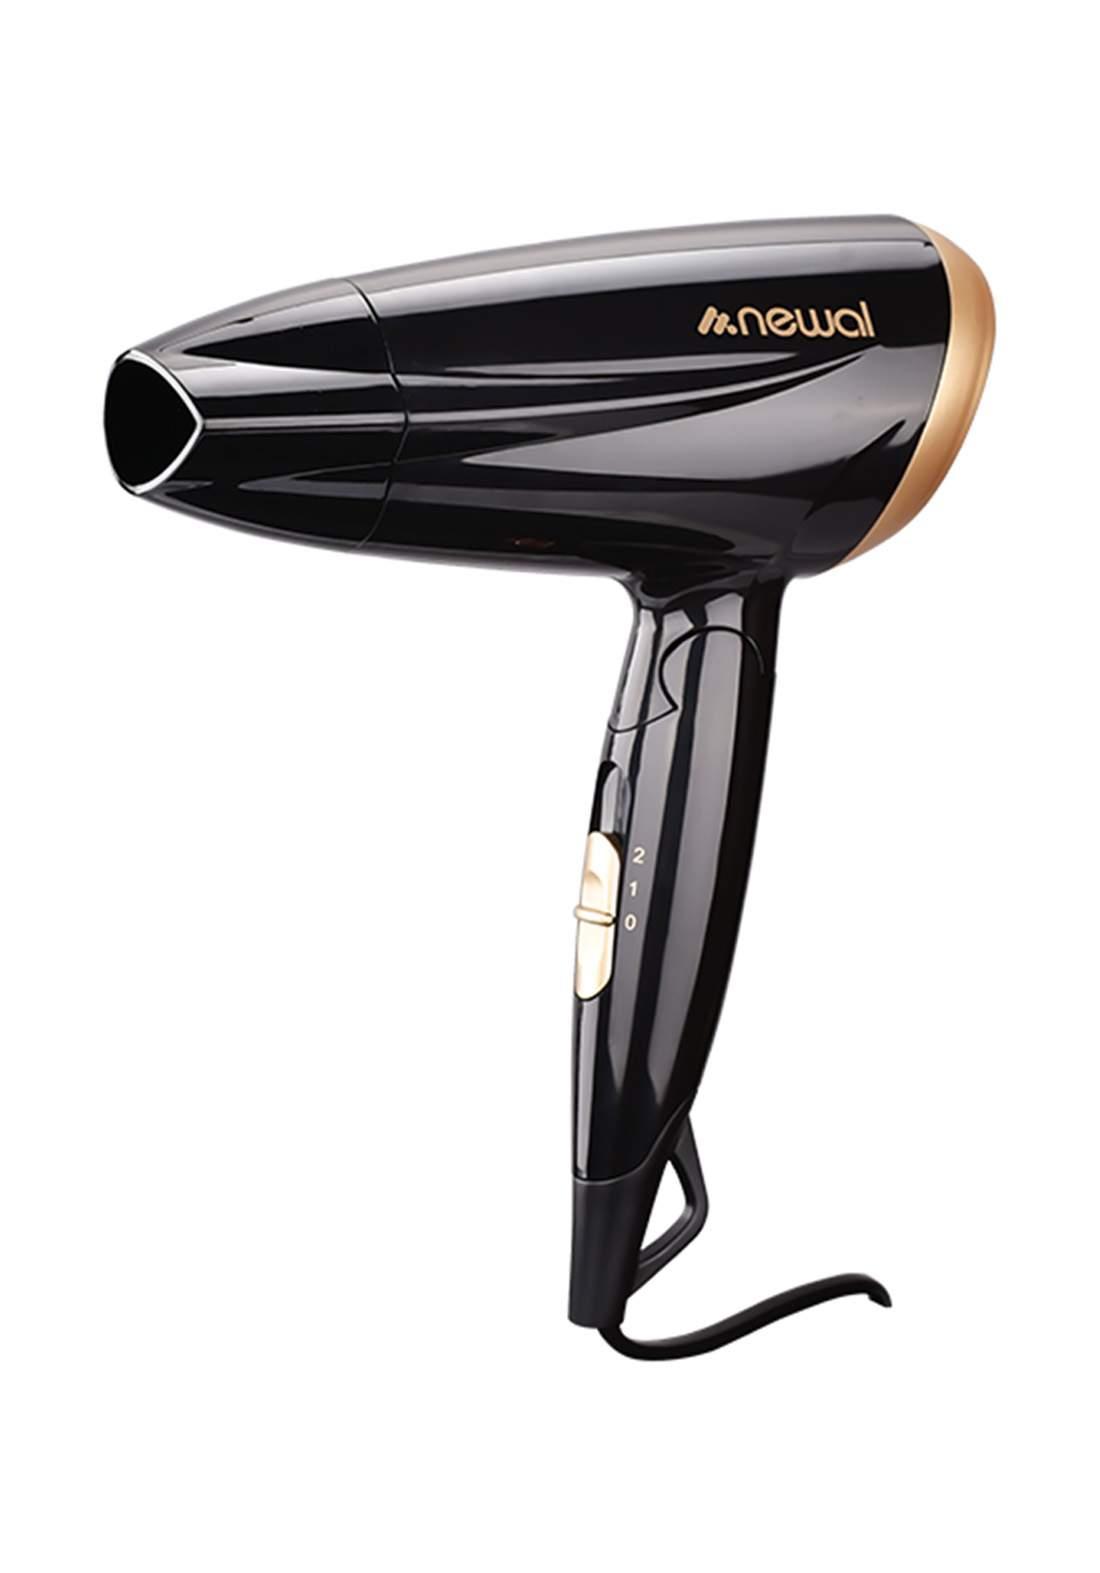 Newal HDR-612 Hair Dryer مجفف الشعر